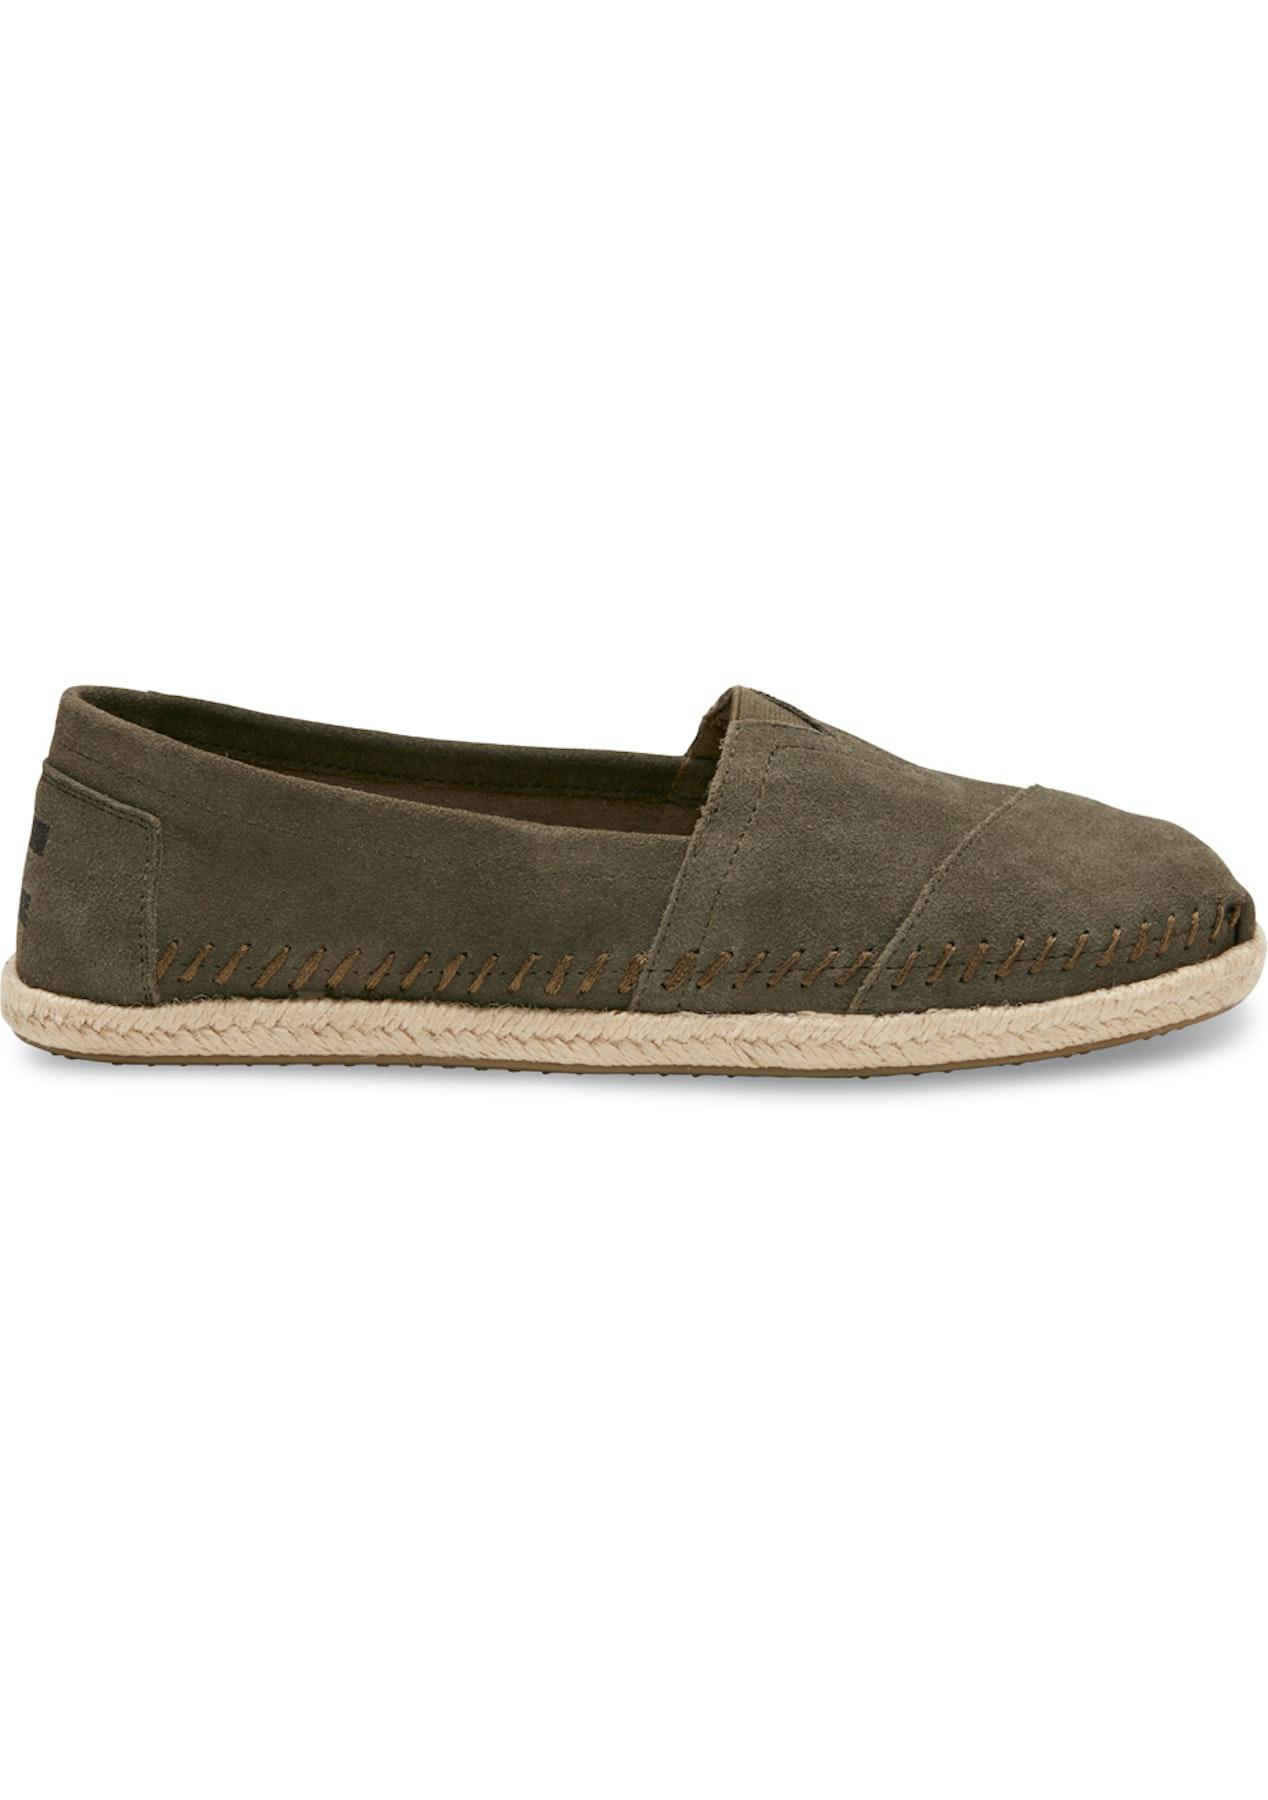 a8a96ce65 Toms - Womens Olive Suede Rope Alpargata Espadrilles - Big Brand Shoes  Outlet - Onceit